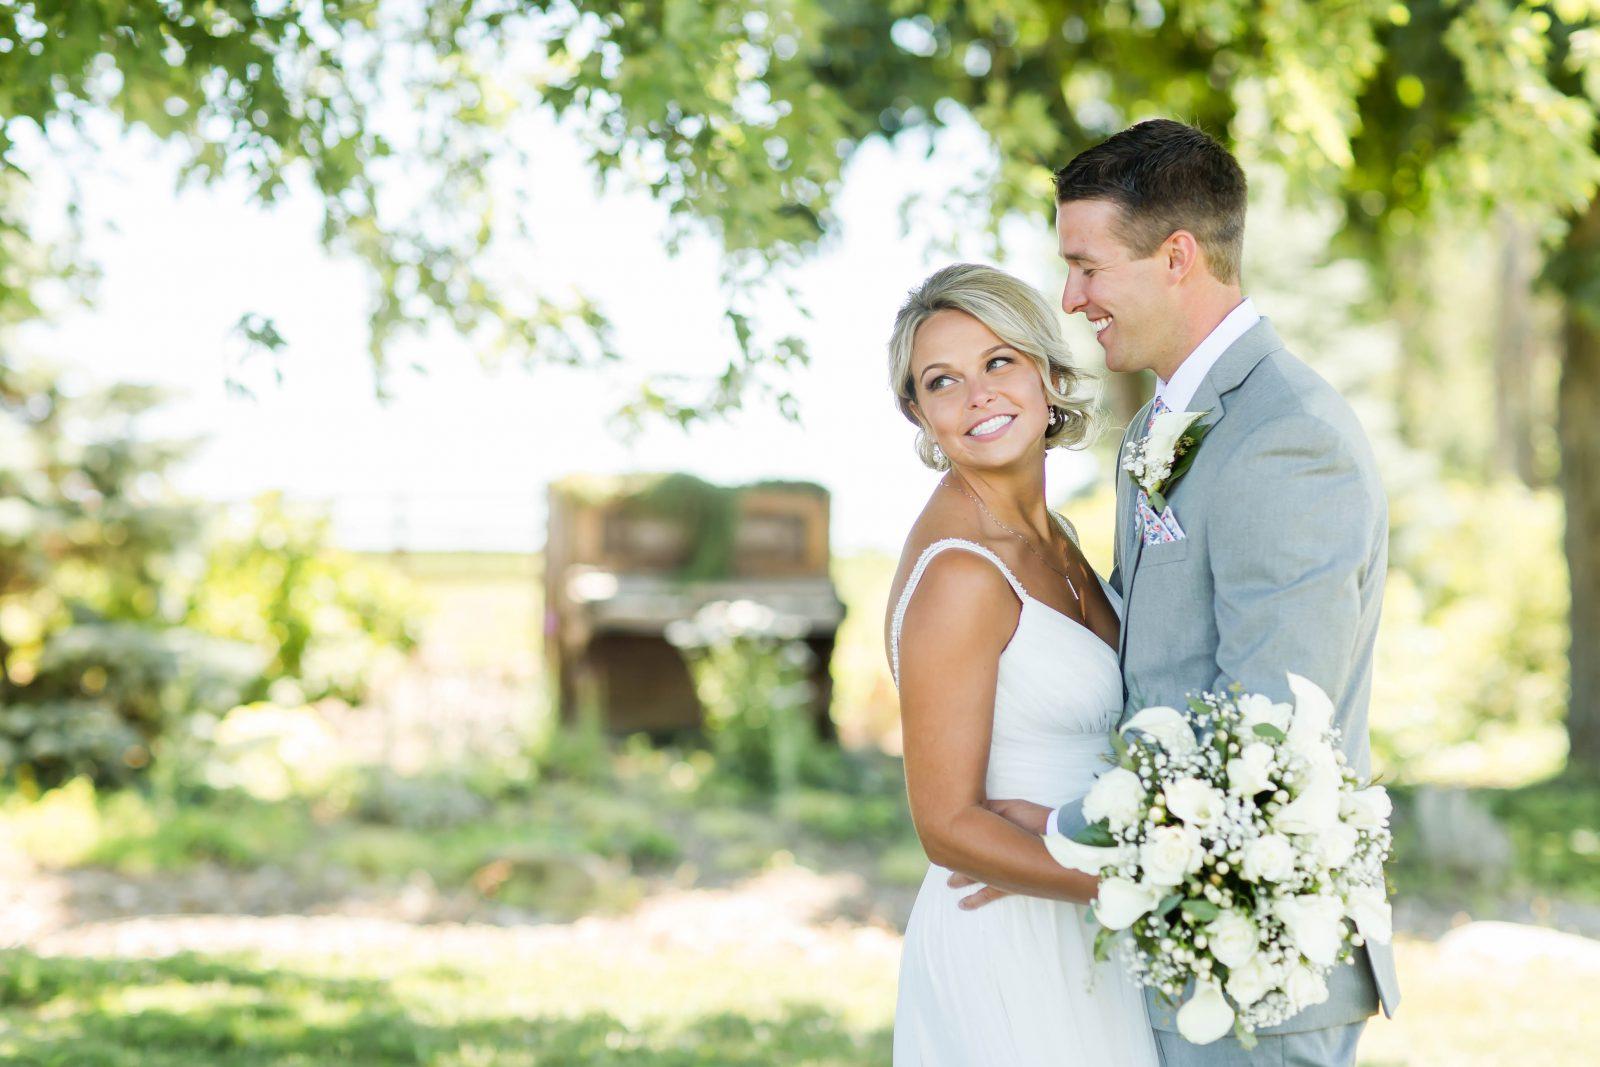 peacock-ridge-summer-wedding-photographer-akron-ohio-loren-jackson-photography-42